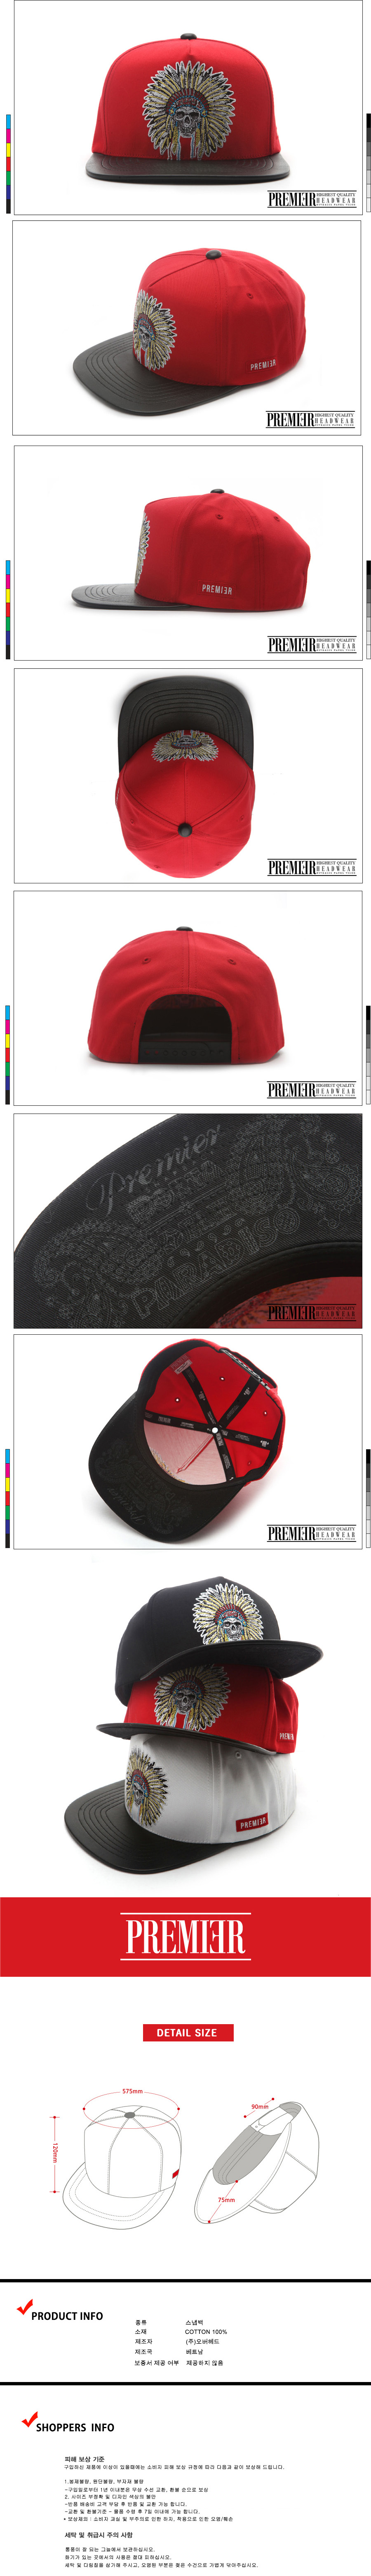 [ PREMIER ] [卓越] Snapback Indion 红色黑色